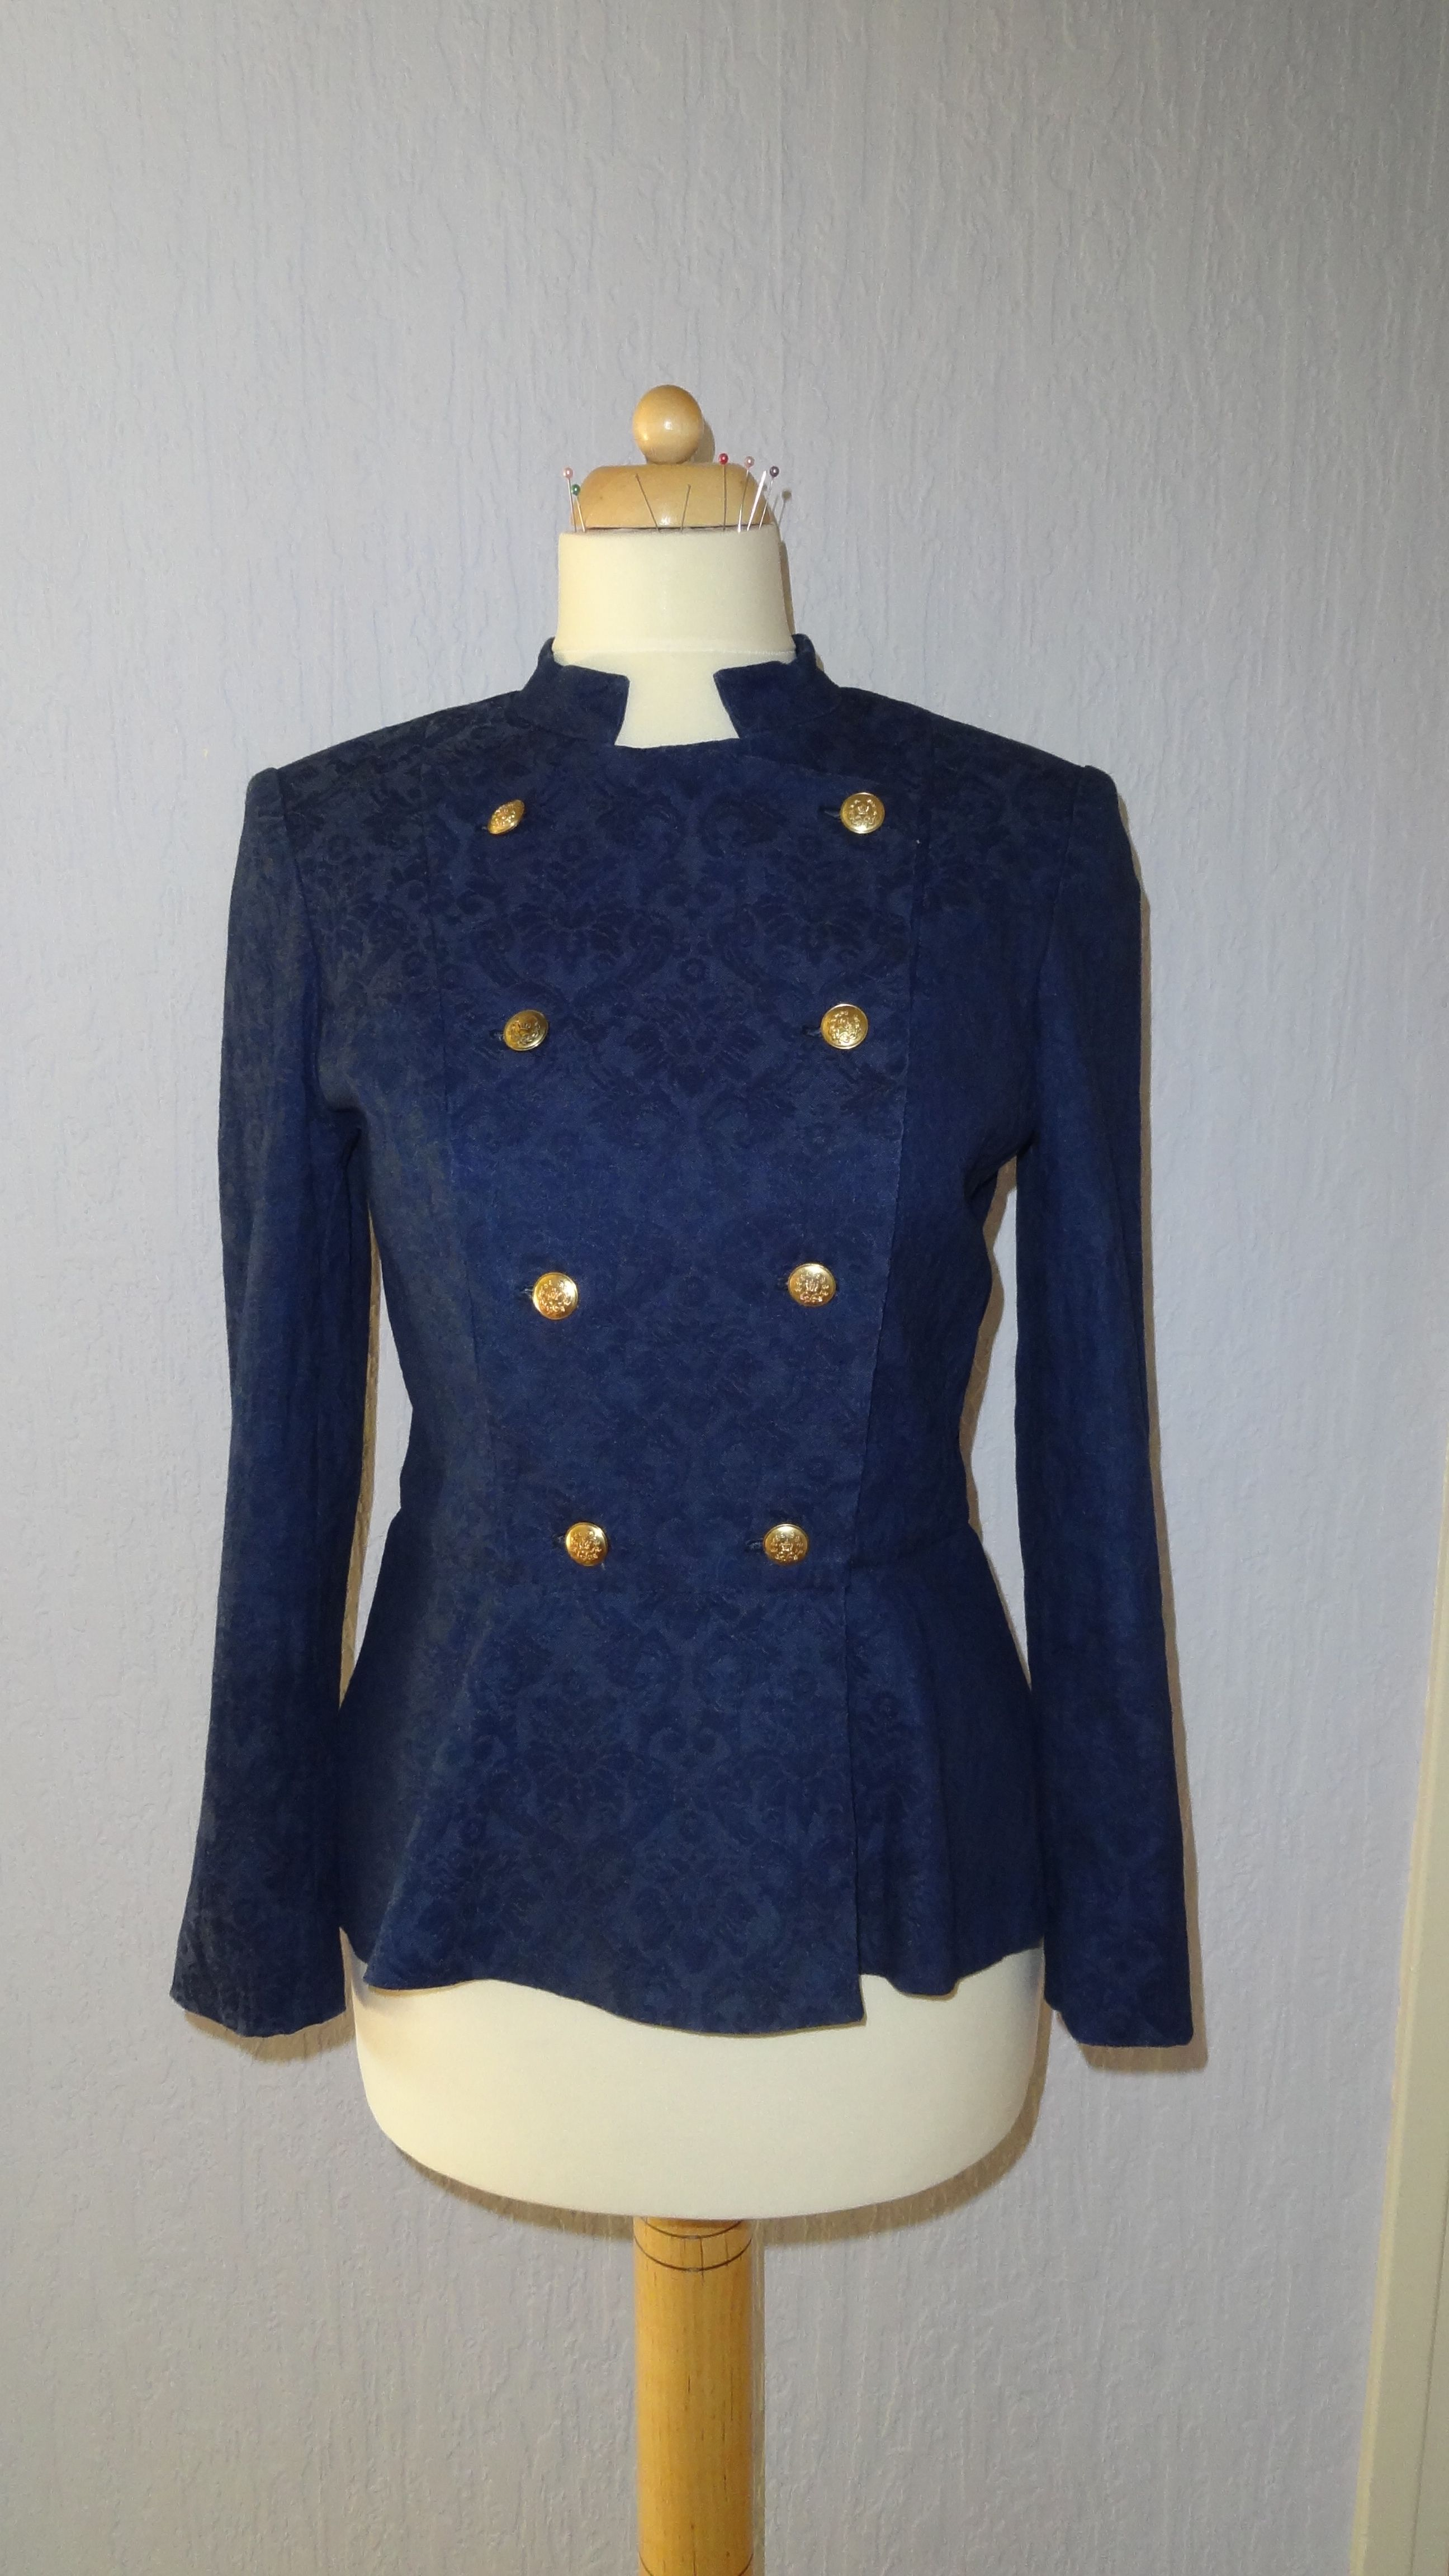 Military inspired jacket with peplum | Schnittmuster